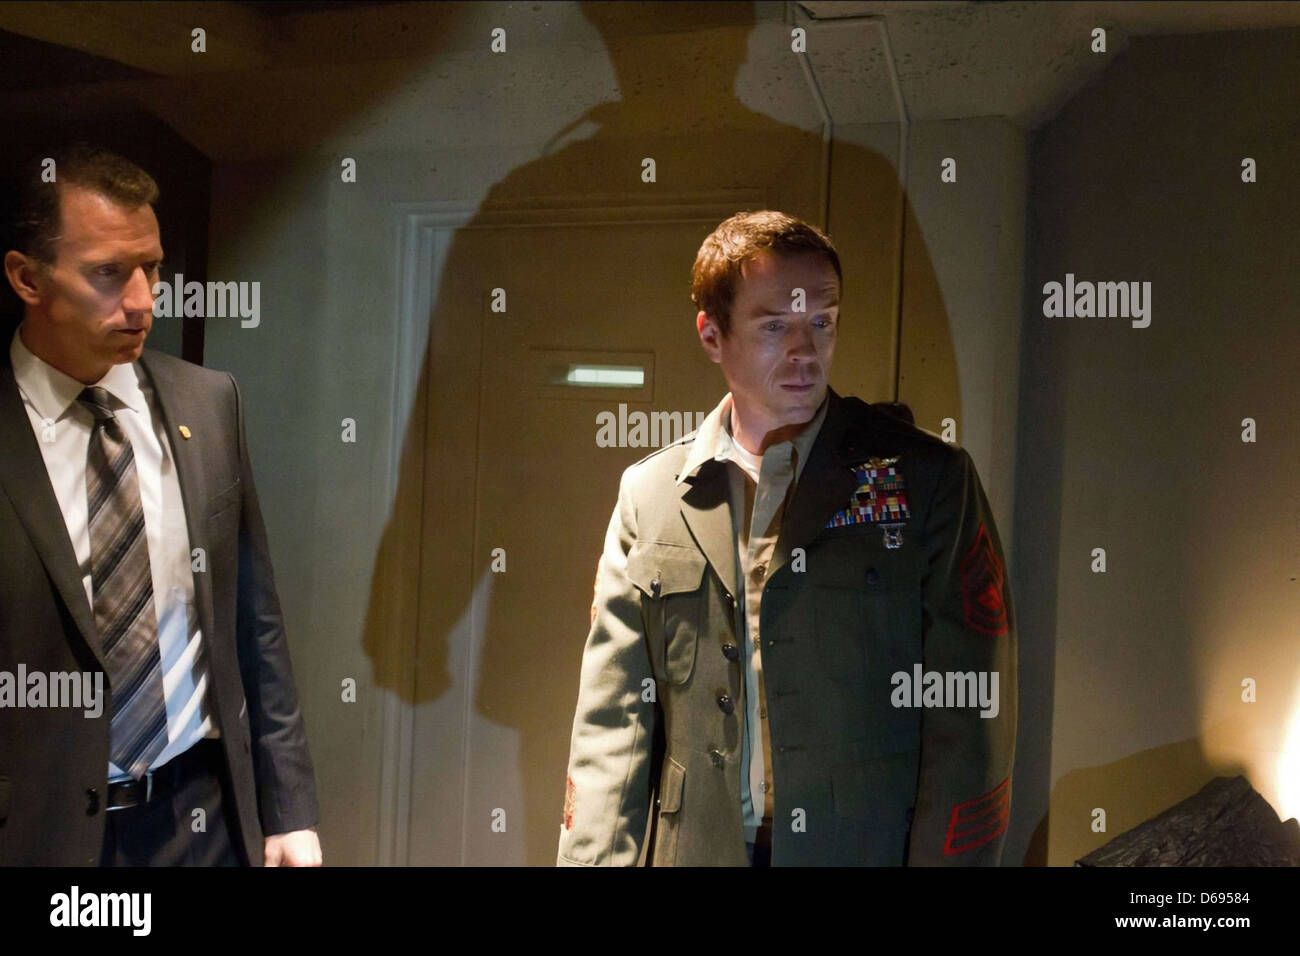 DAMIAN LEWIS HOMELAND (2011) - Stock Image